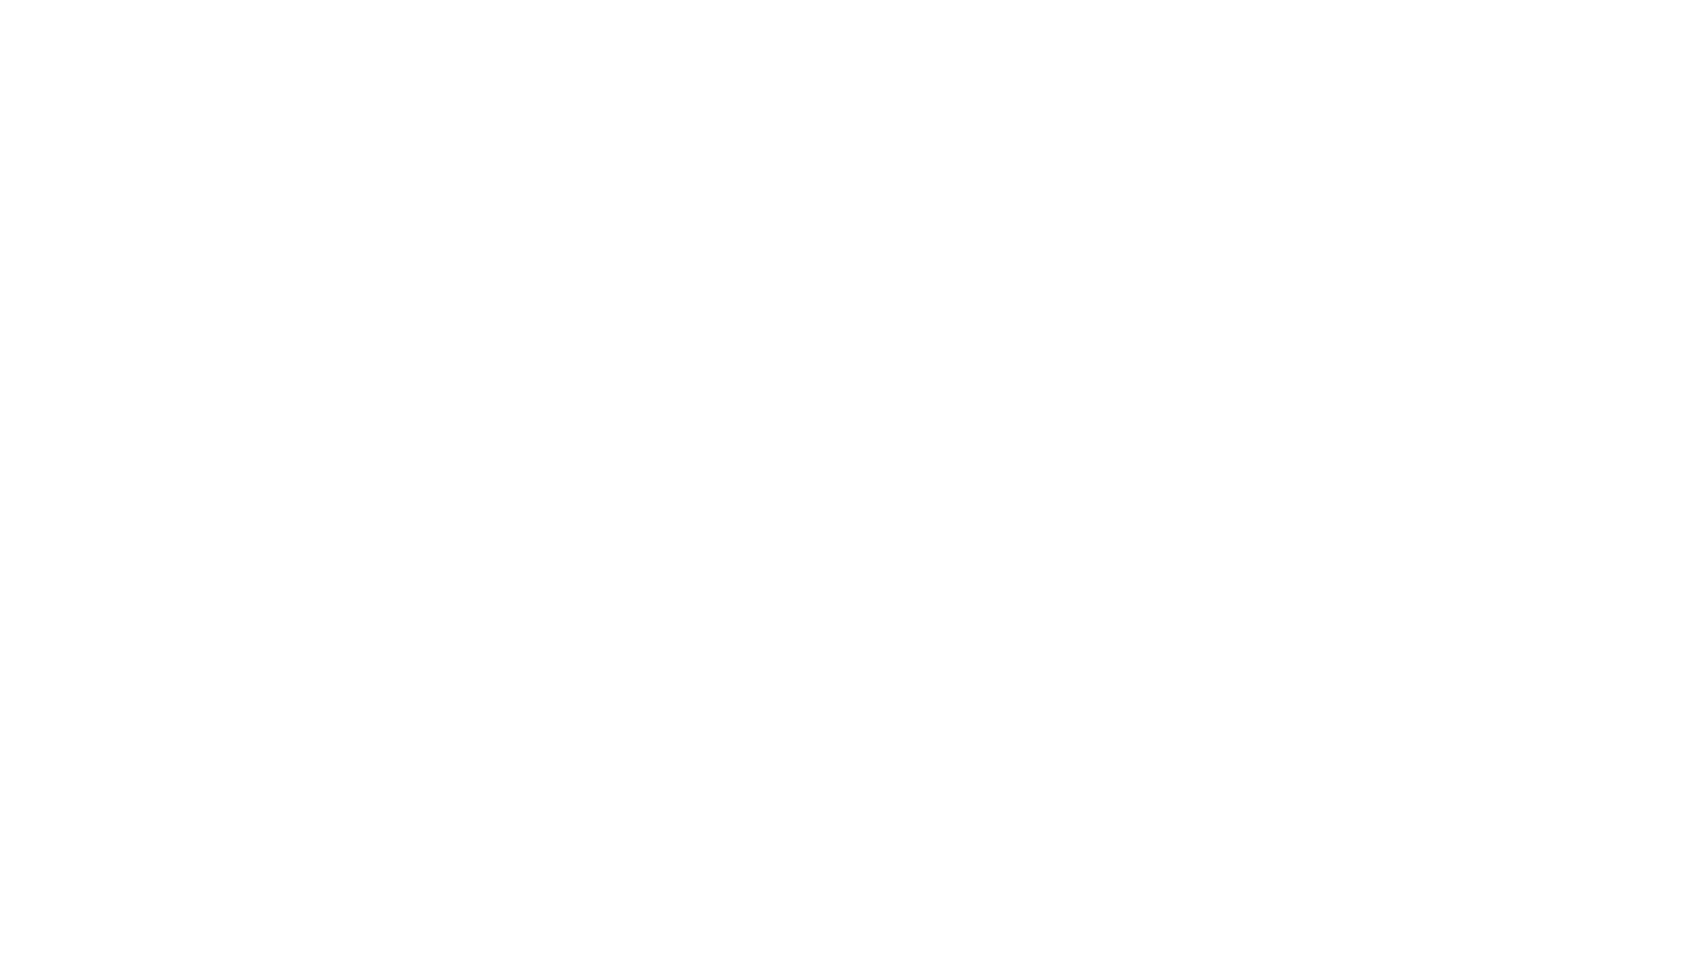 Black Fishnet Hosiery